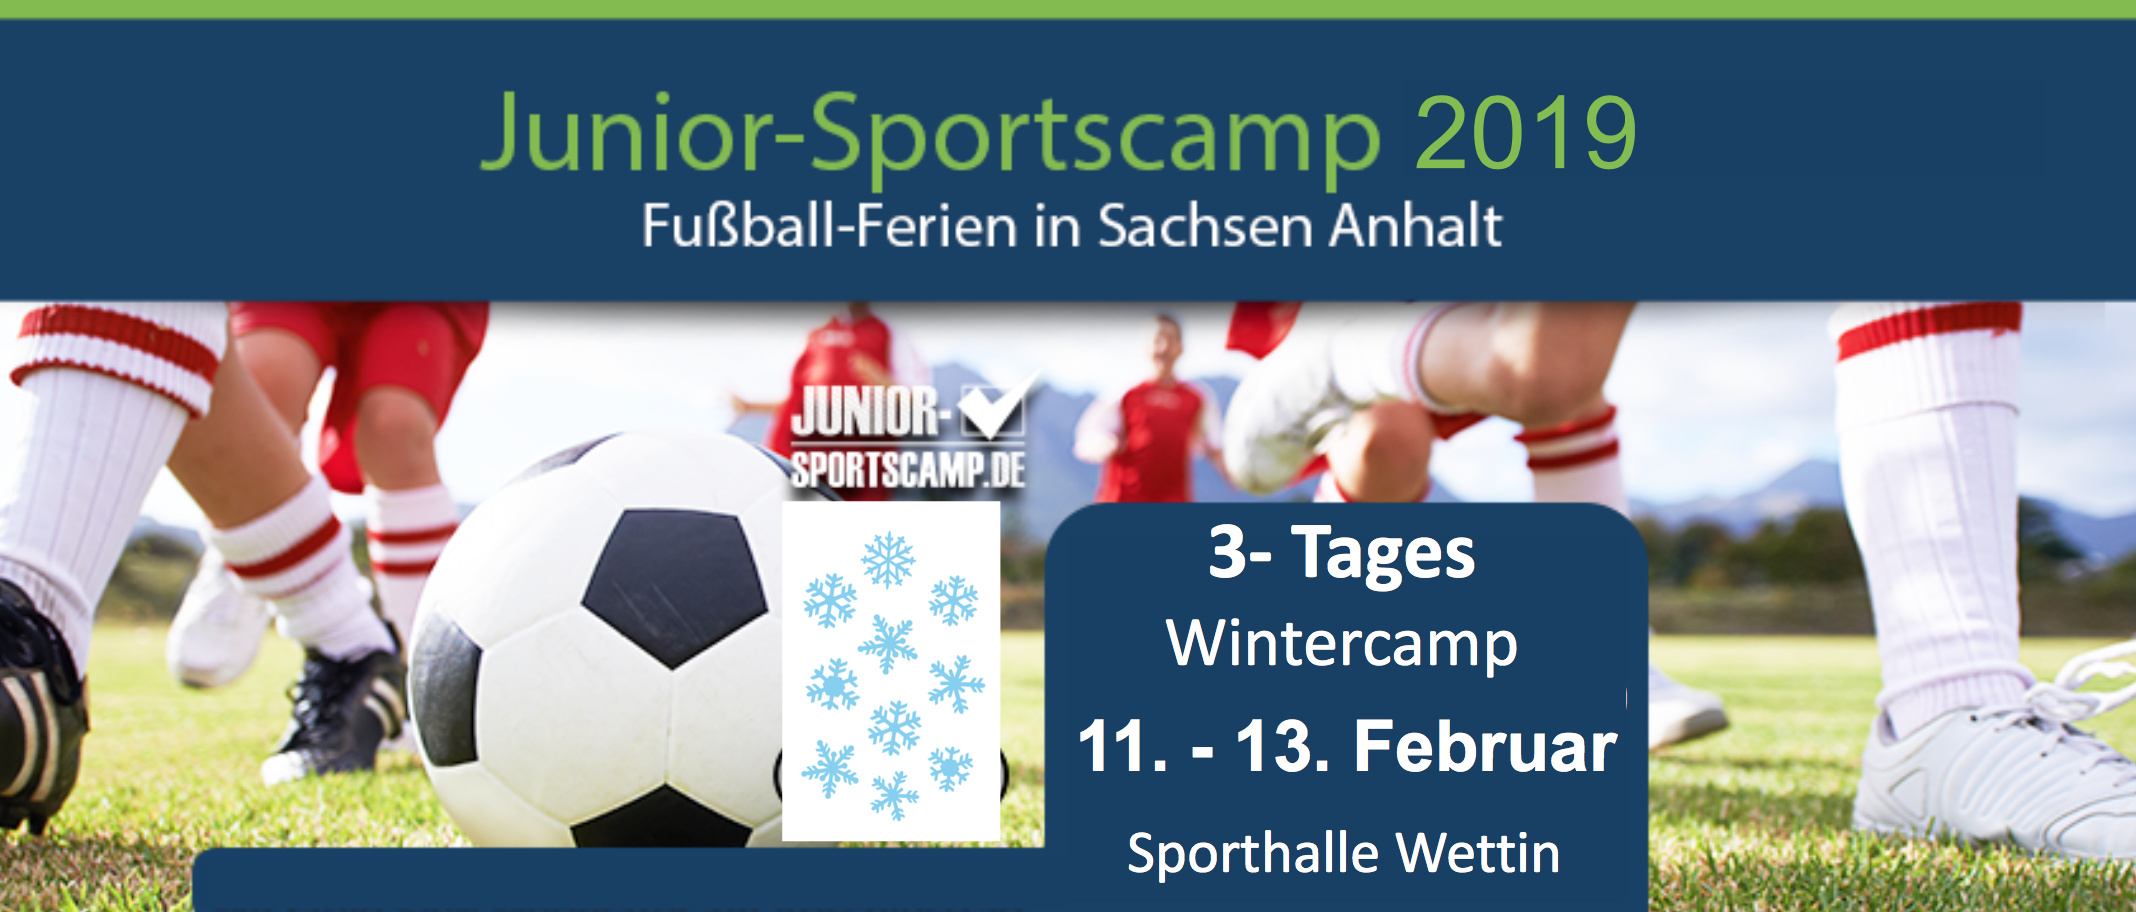 Wintercamp.Wettin.11.-13.02.19